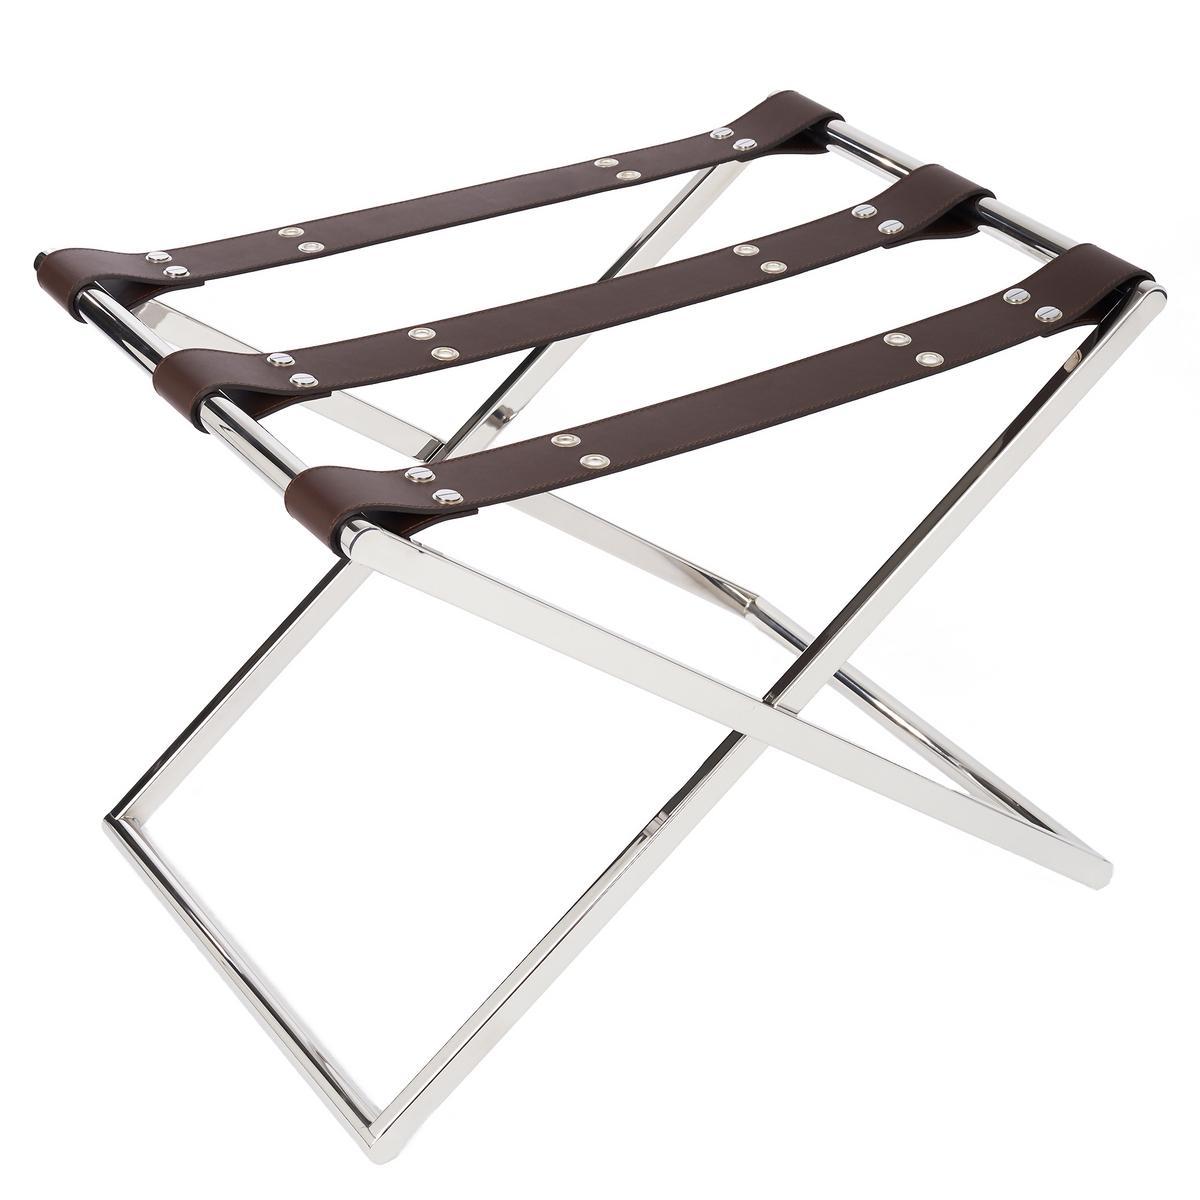 luggage rack for bedroom.  Riviere Straps luggage racks Artedona com